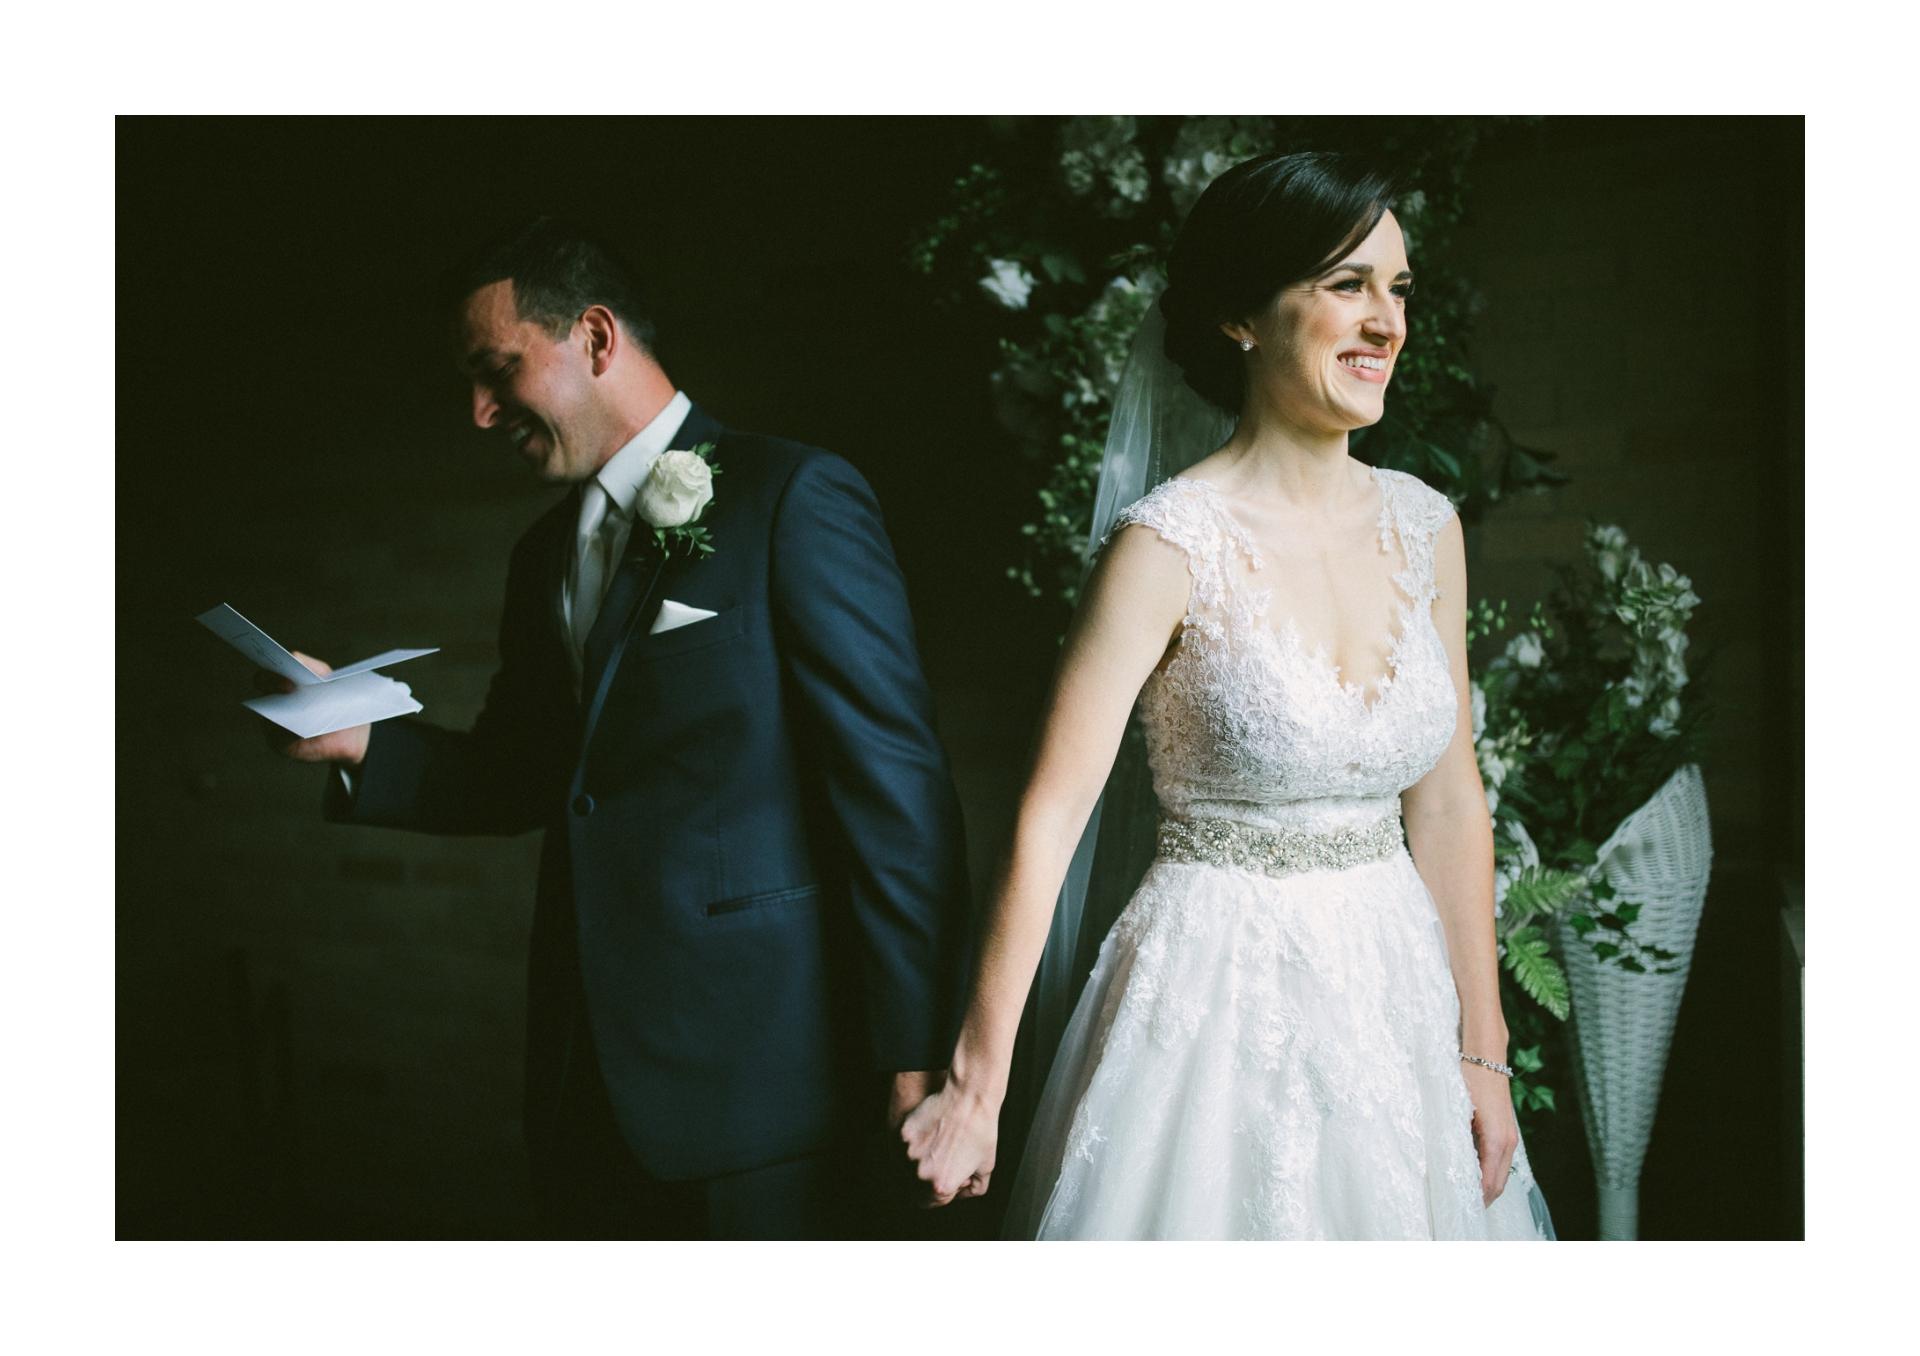 Intercontinental Hotel Wedding in Cleveland 1 19.jpg